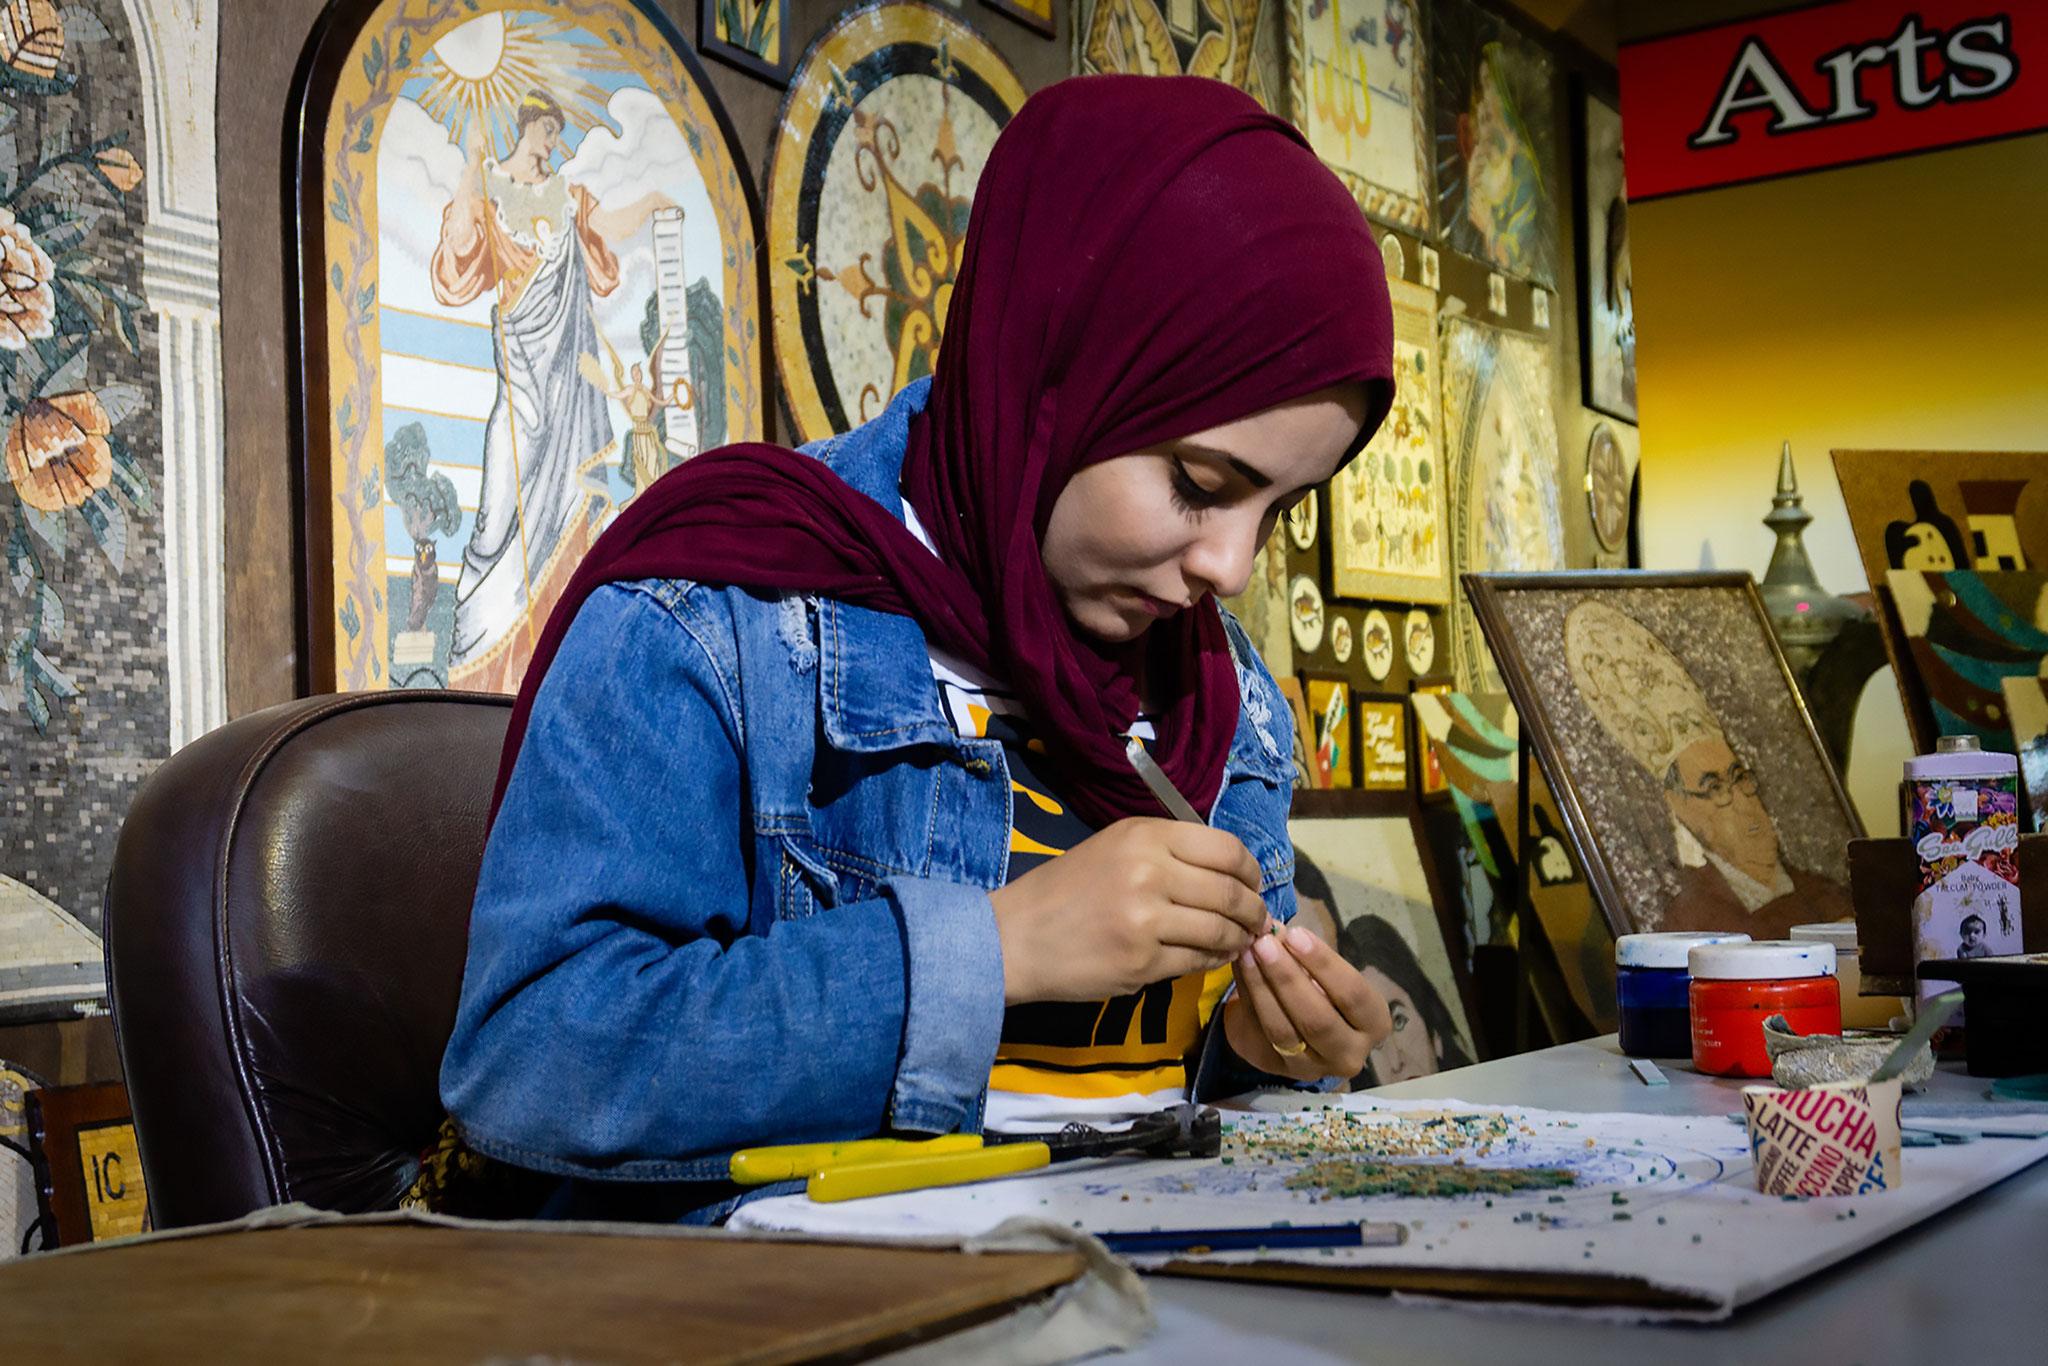 Cecilia Franci (Italy) - Jordanian girl working at the mosaic art